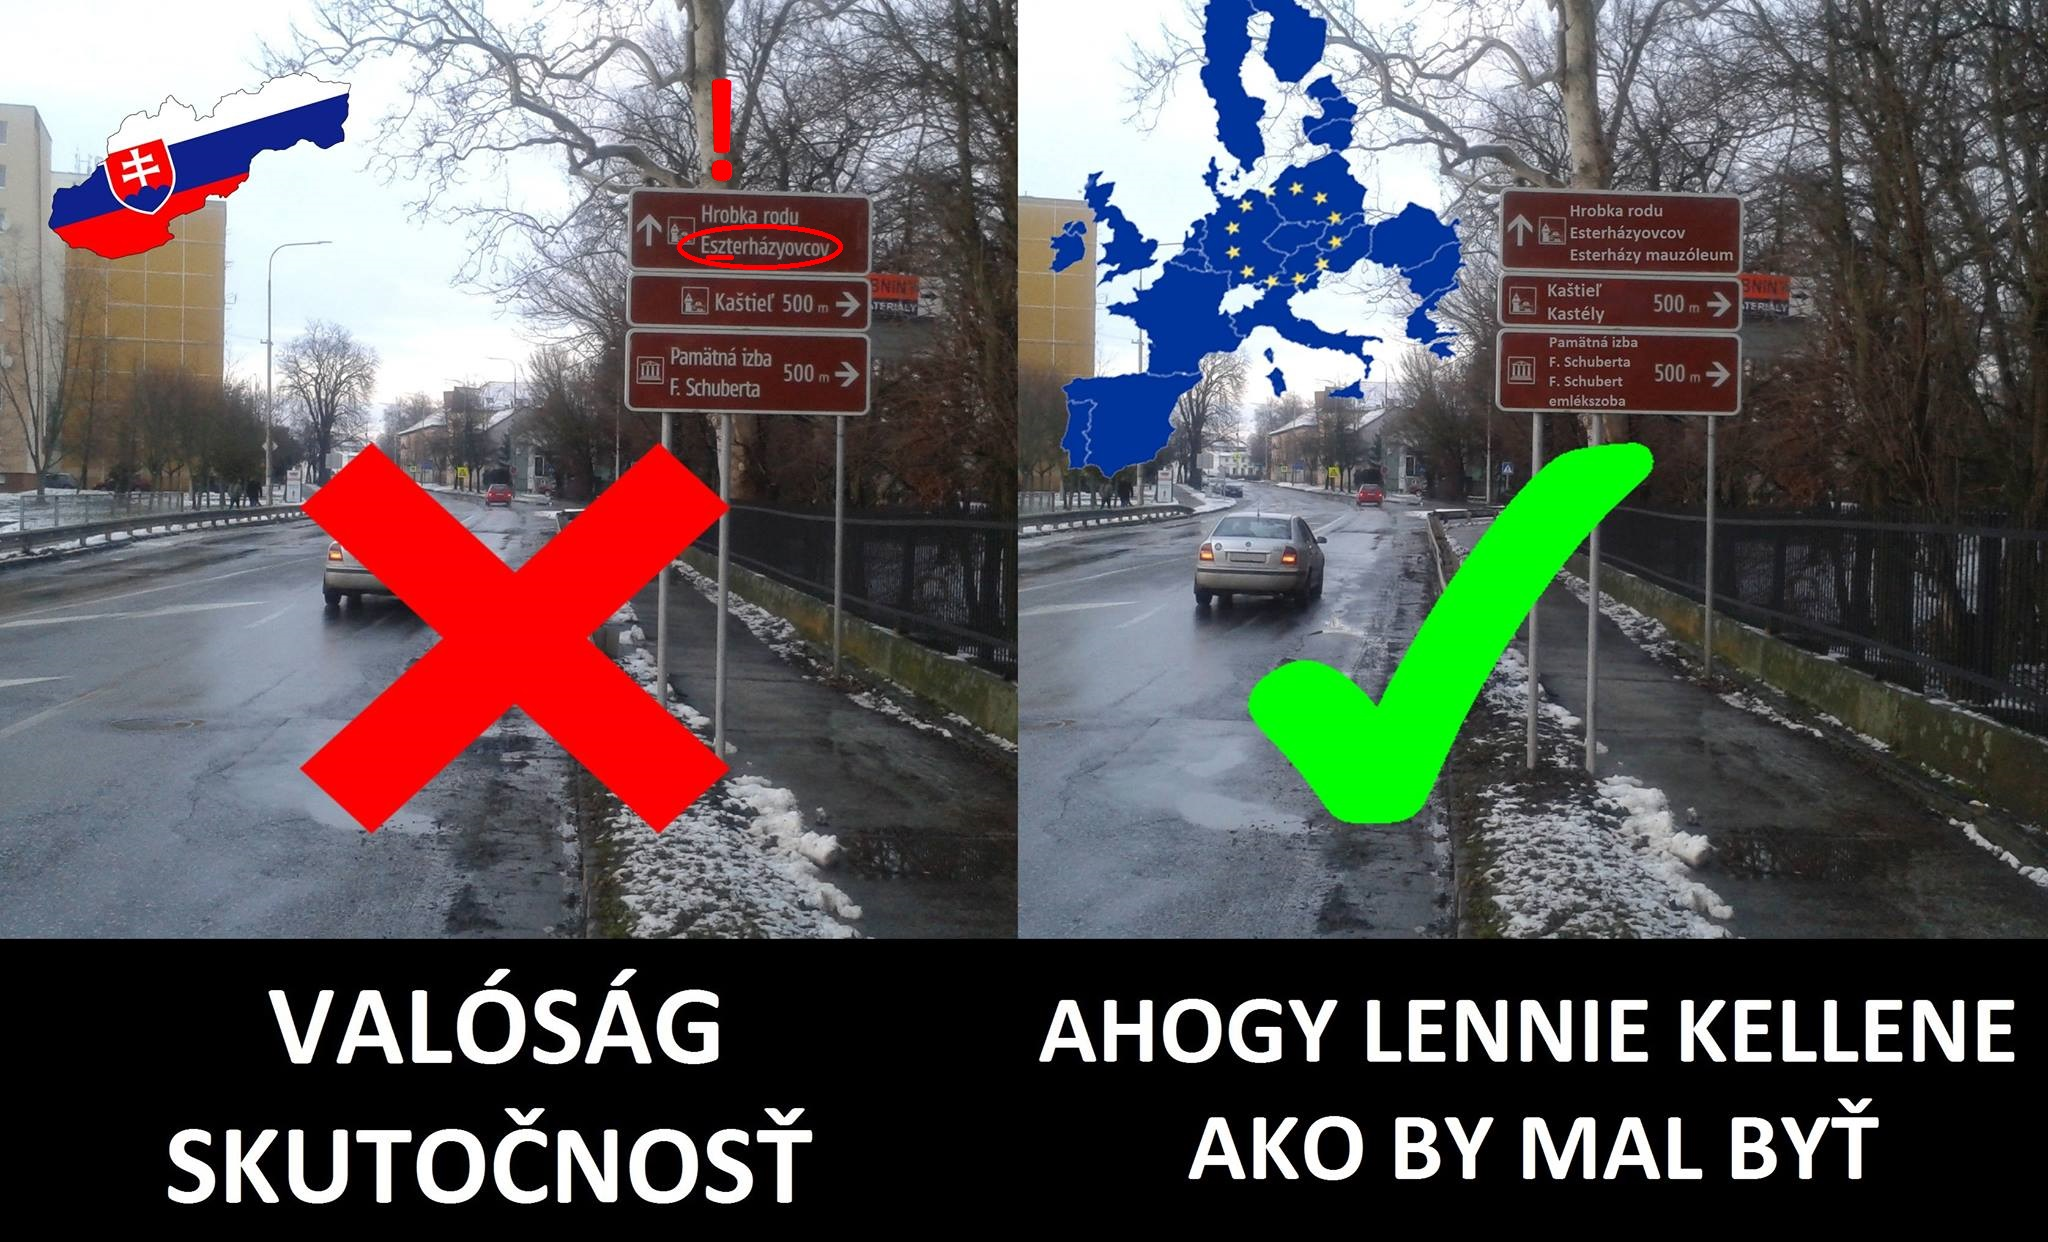 kep_csoanka_akos.jpg